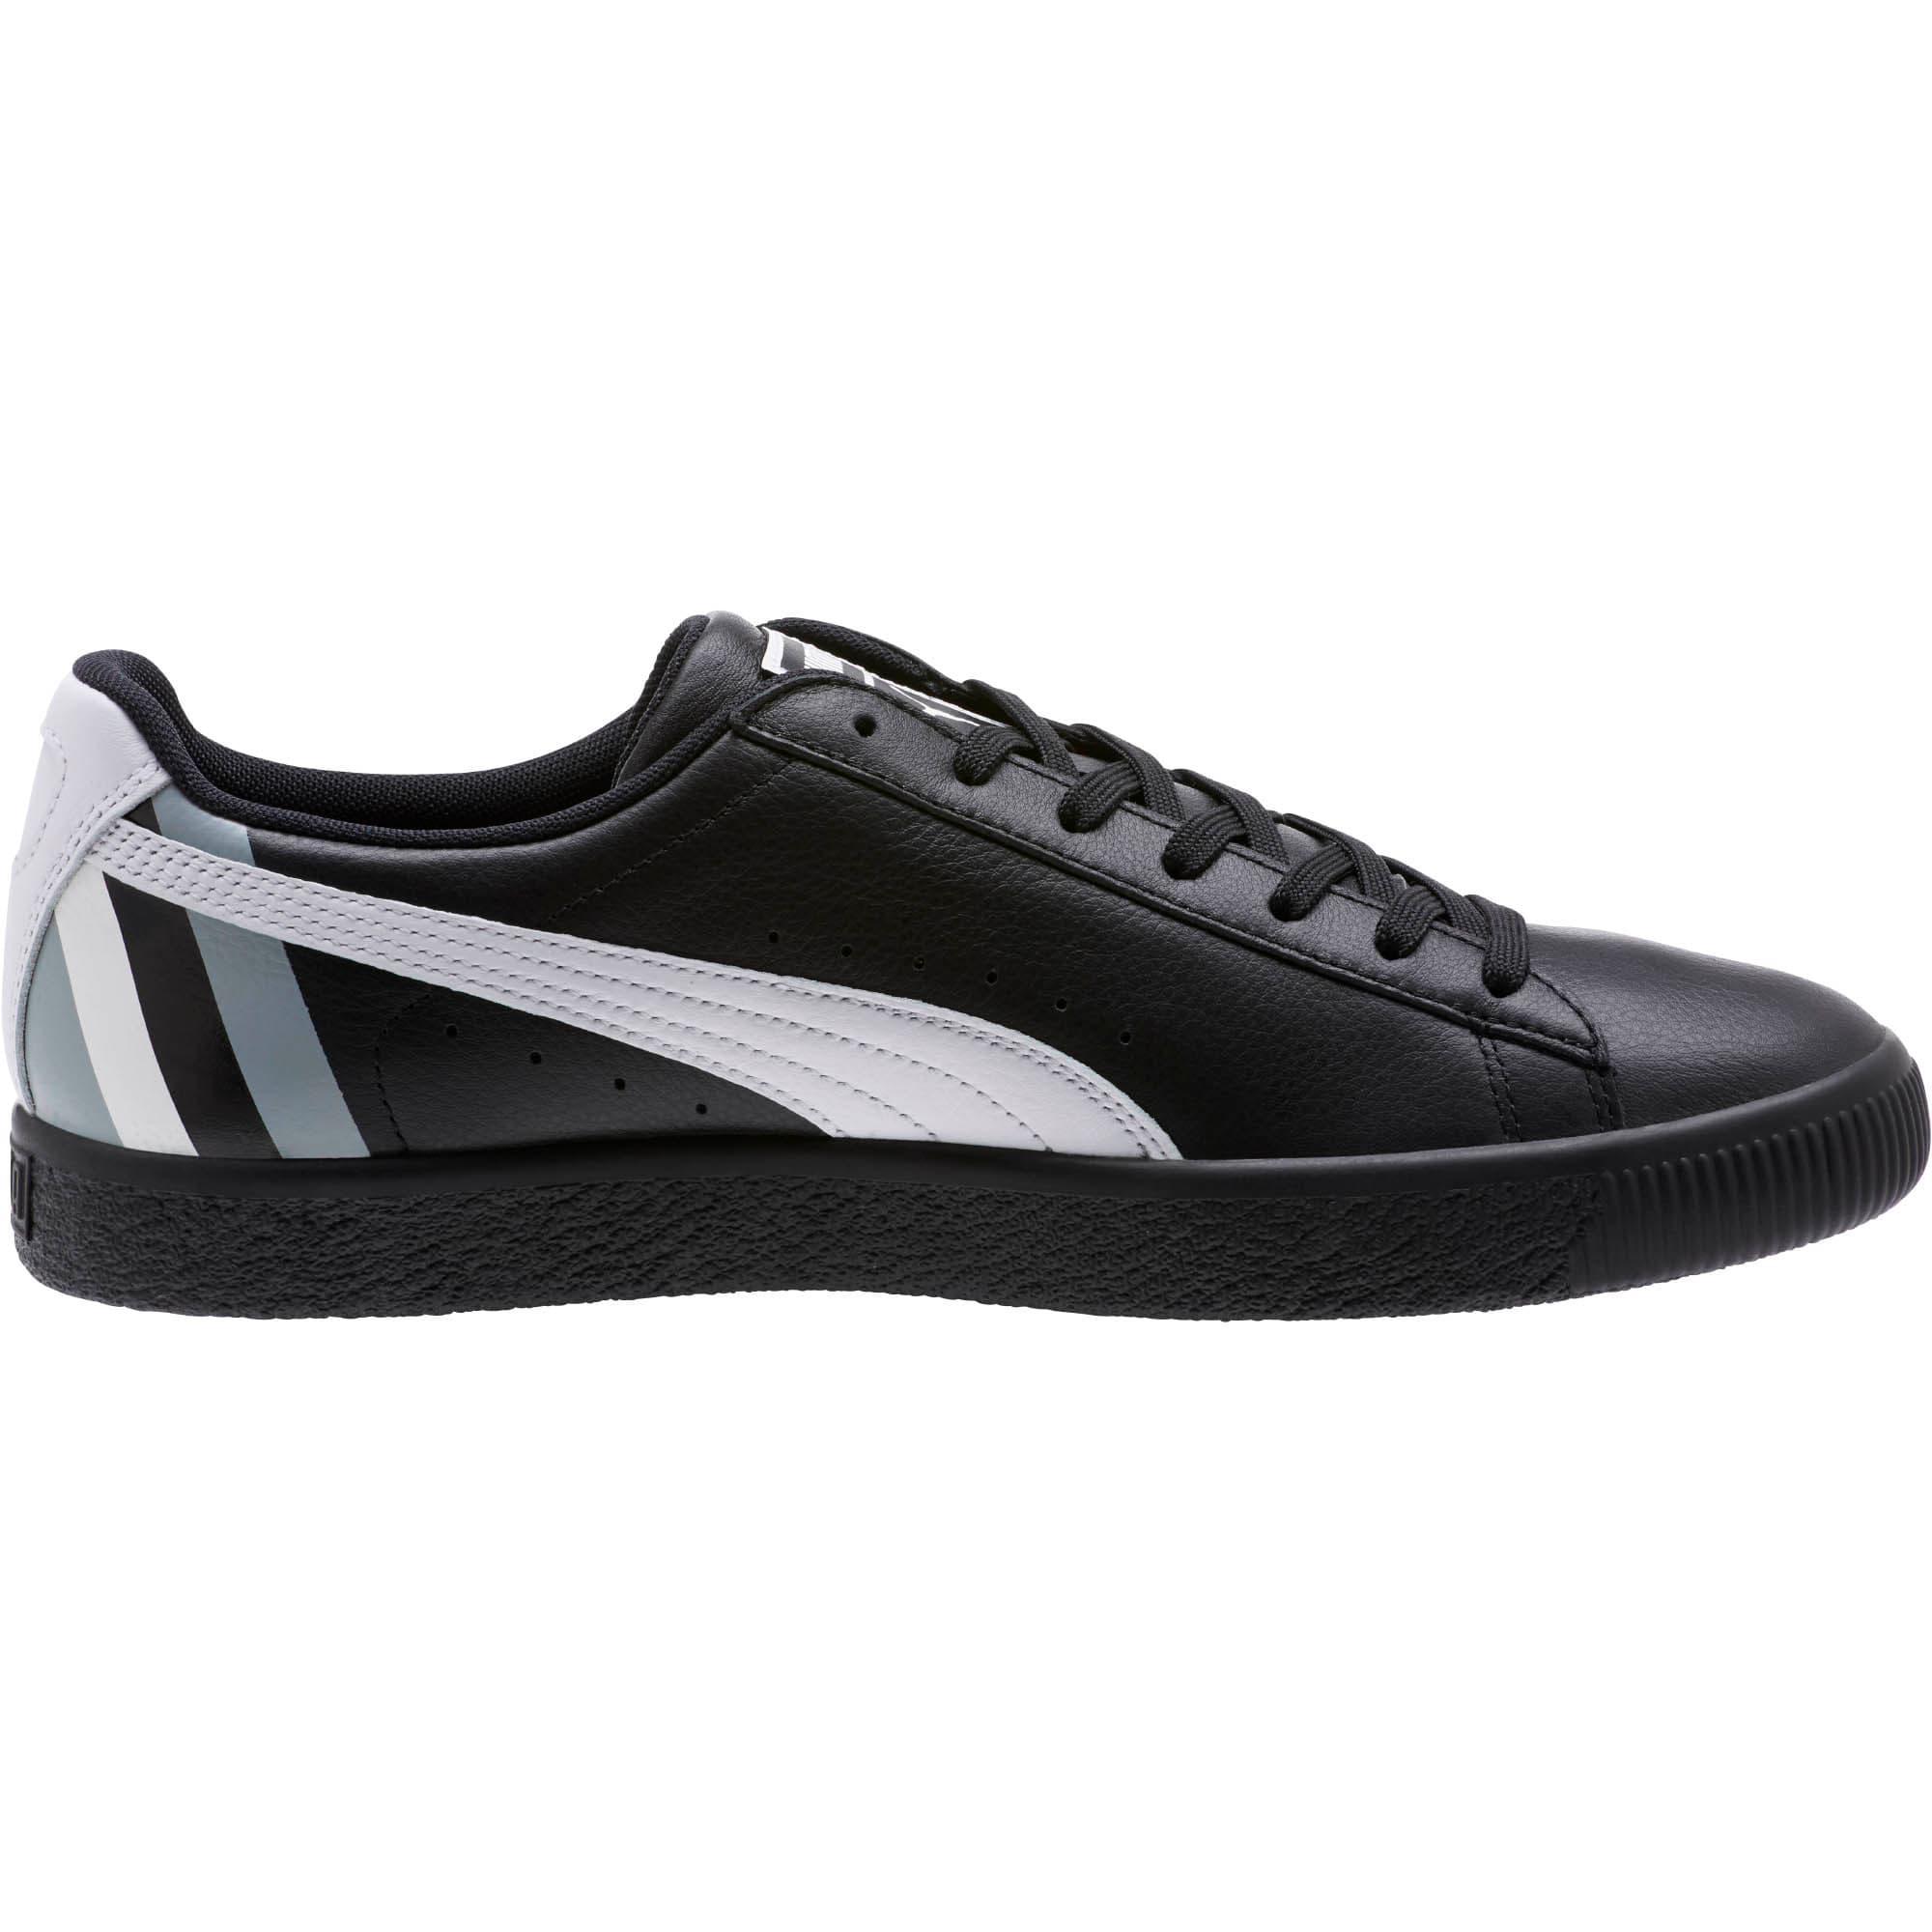 Thumbnail 3 of Clyde Stripes Men's Sneakers, Puma Black-Puma White, medium